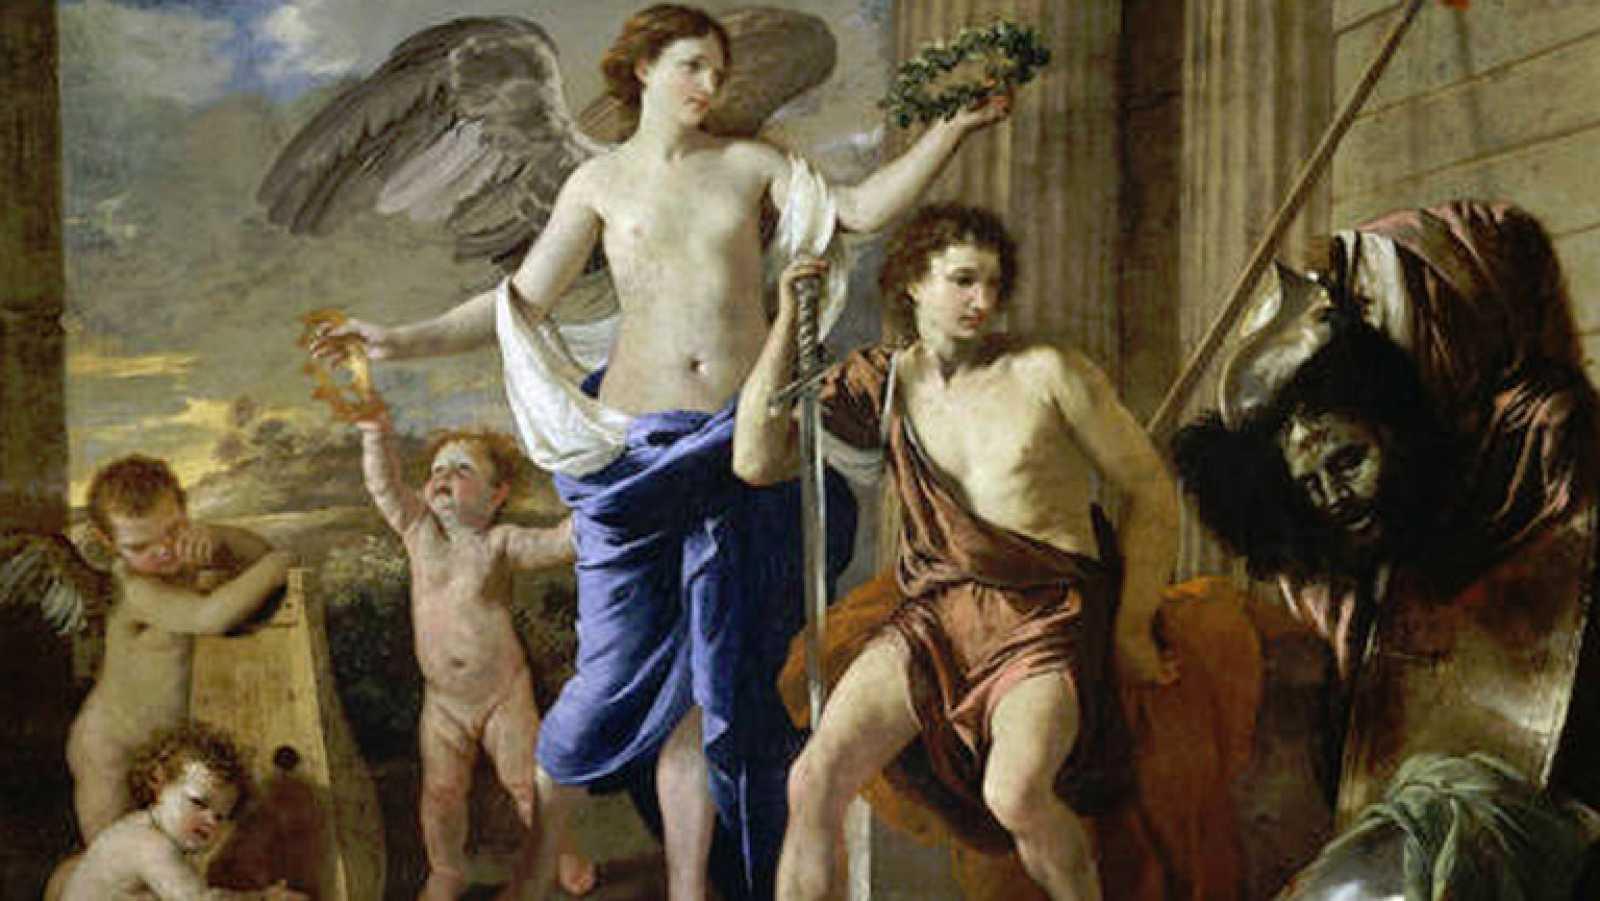 Mirar un cuadro - El triunfo de David (Poussin)